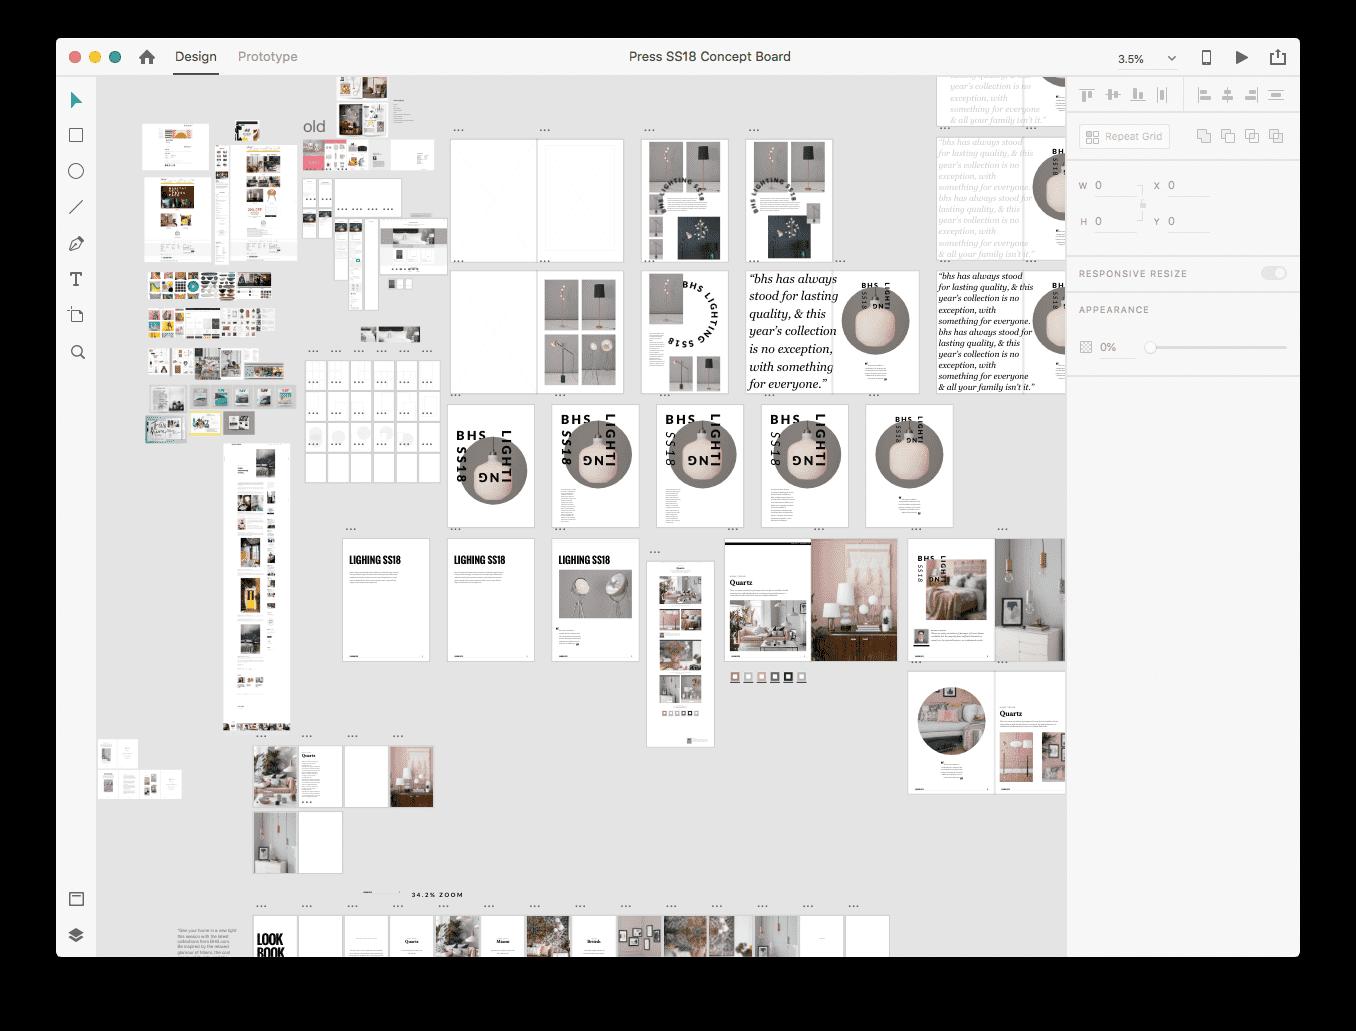 Press_Workspace_Screenshot.png